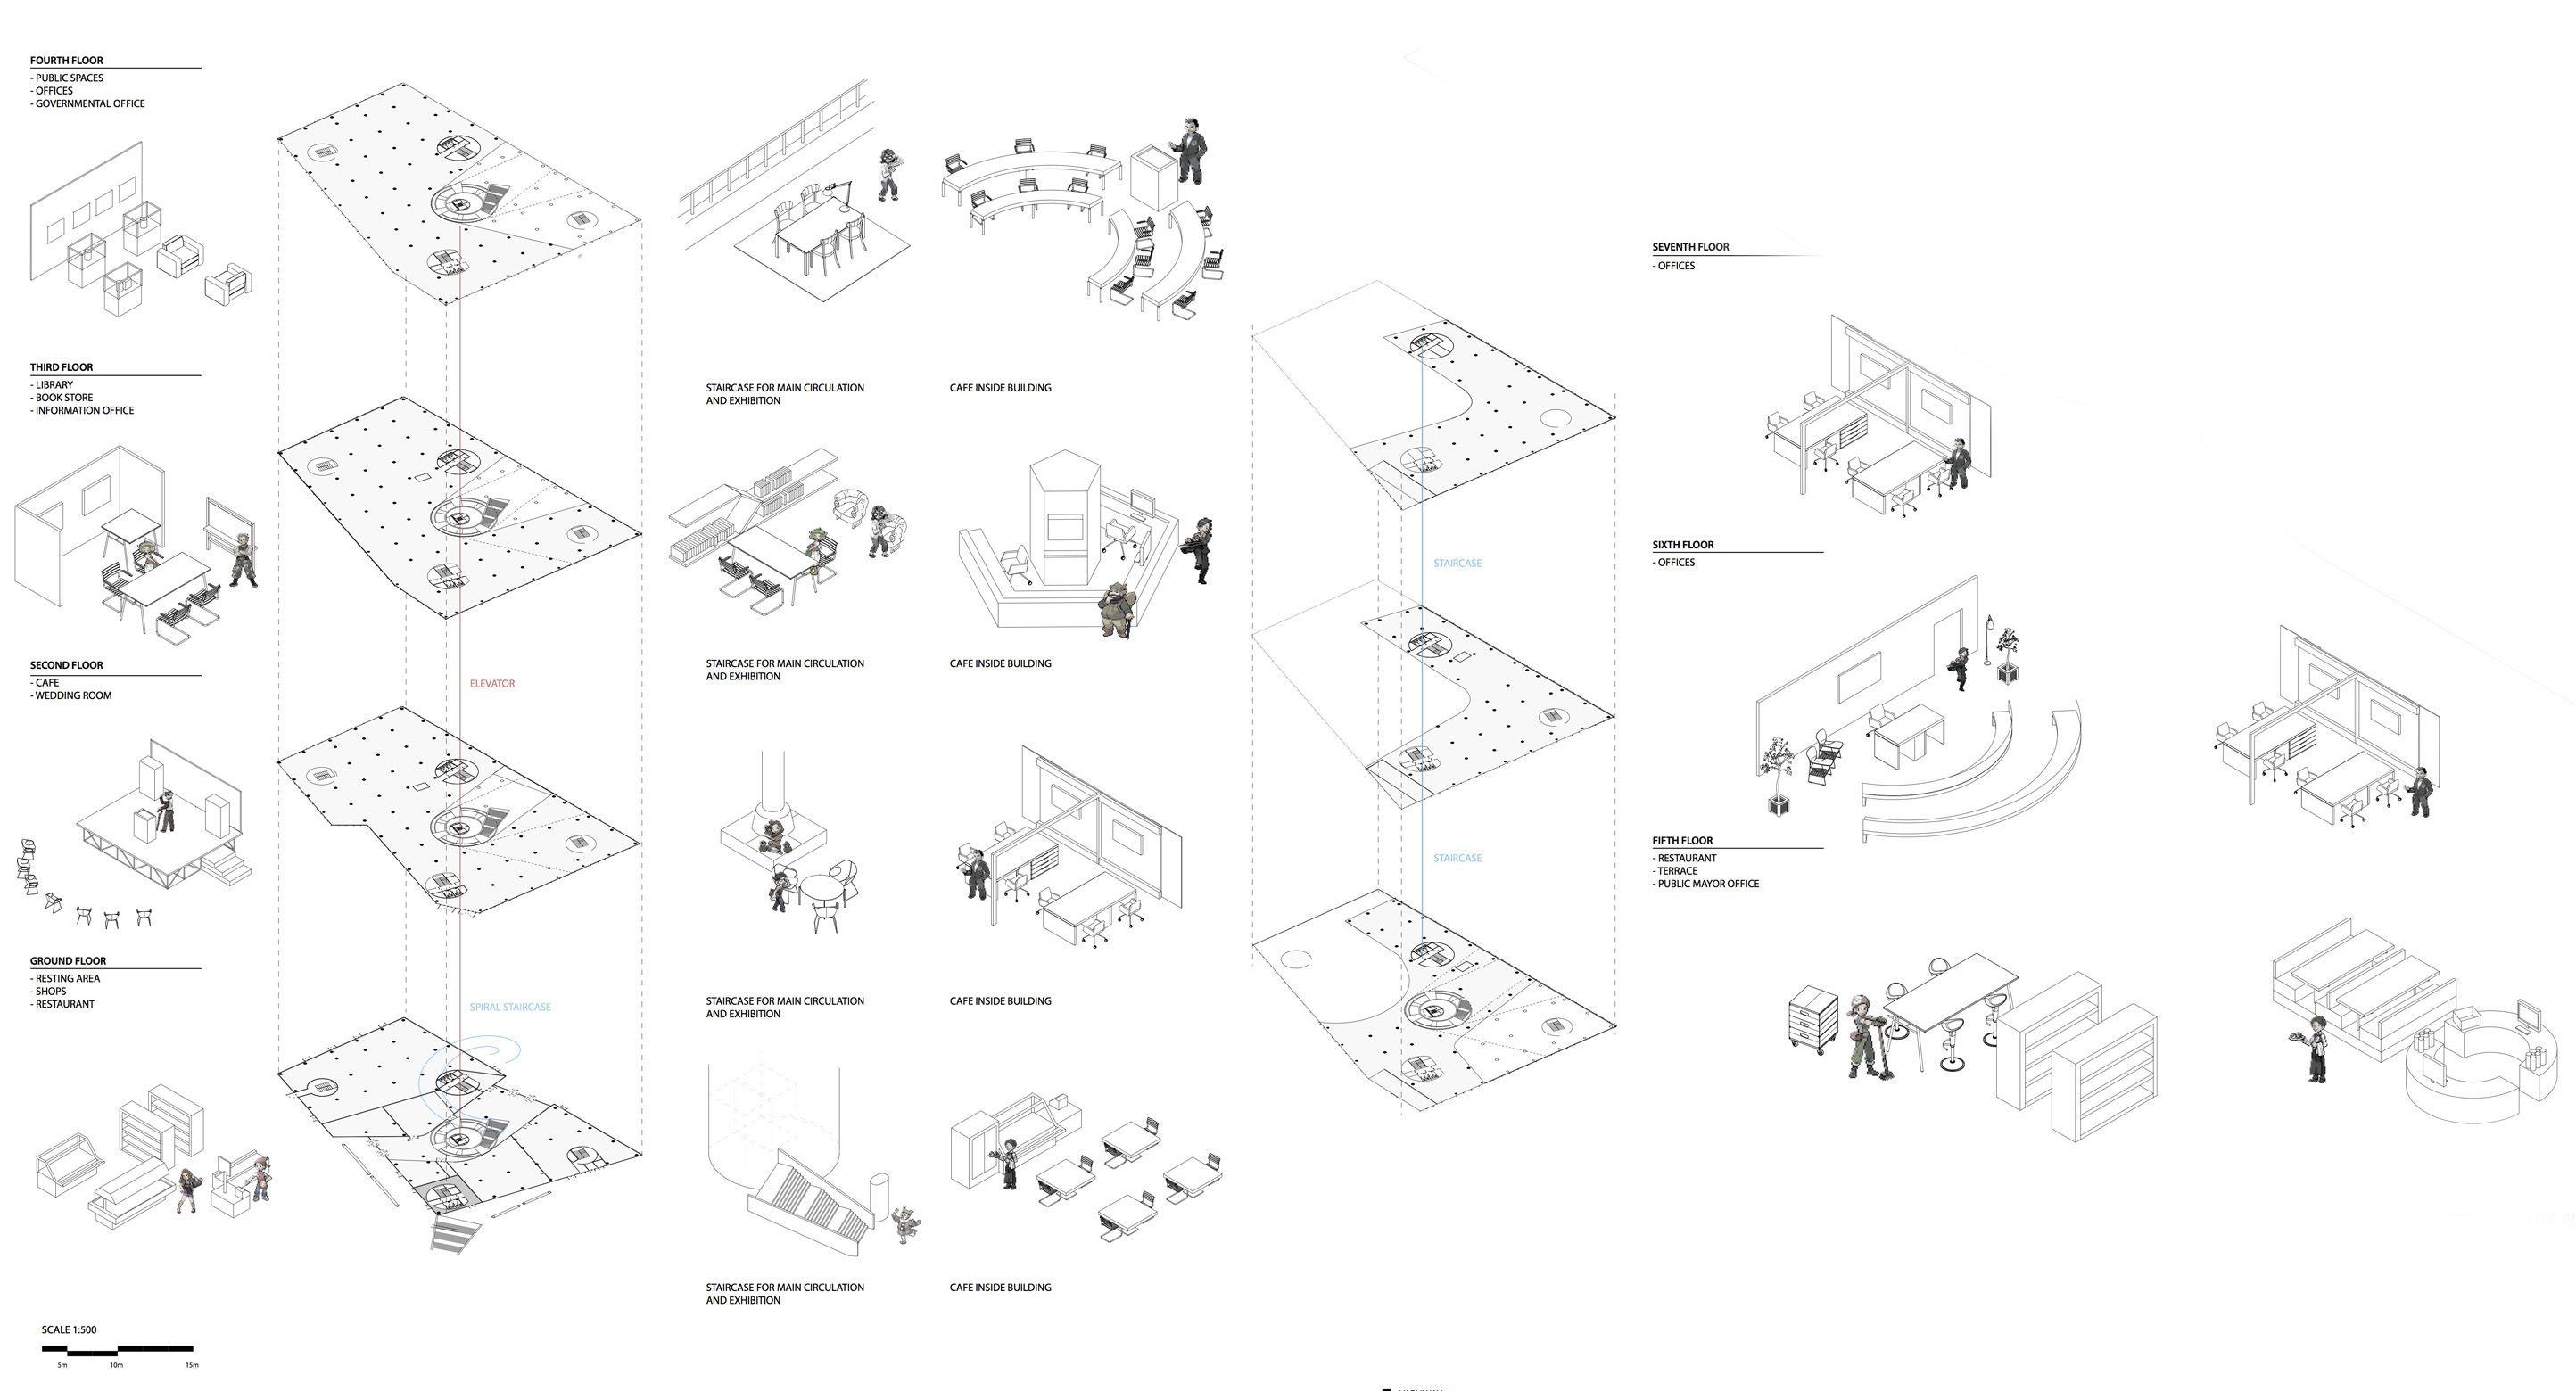 credit kannawat limratepong floor plan activity isometric